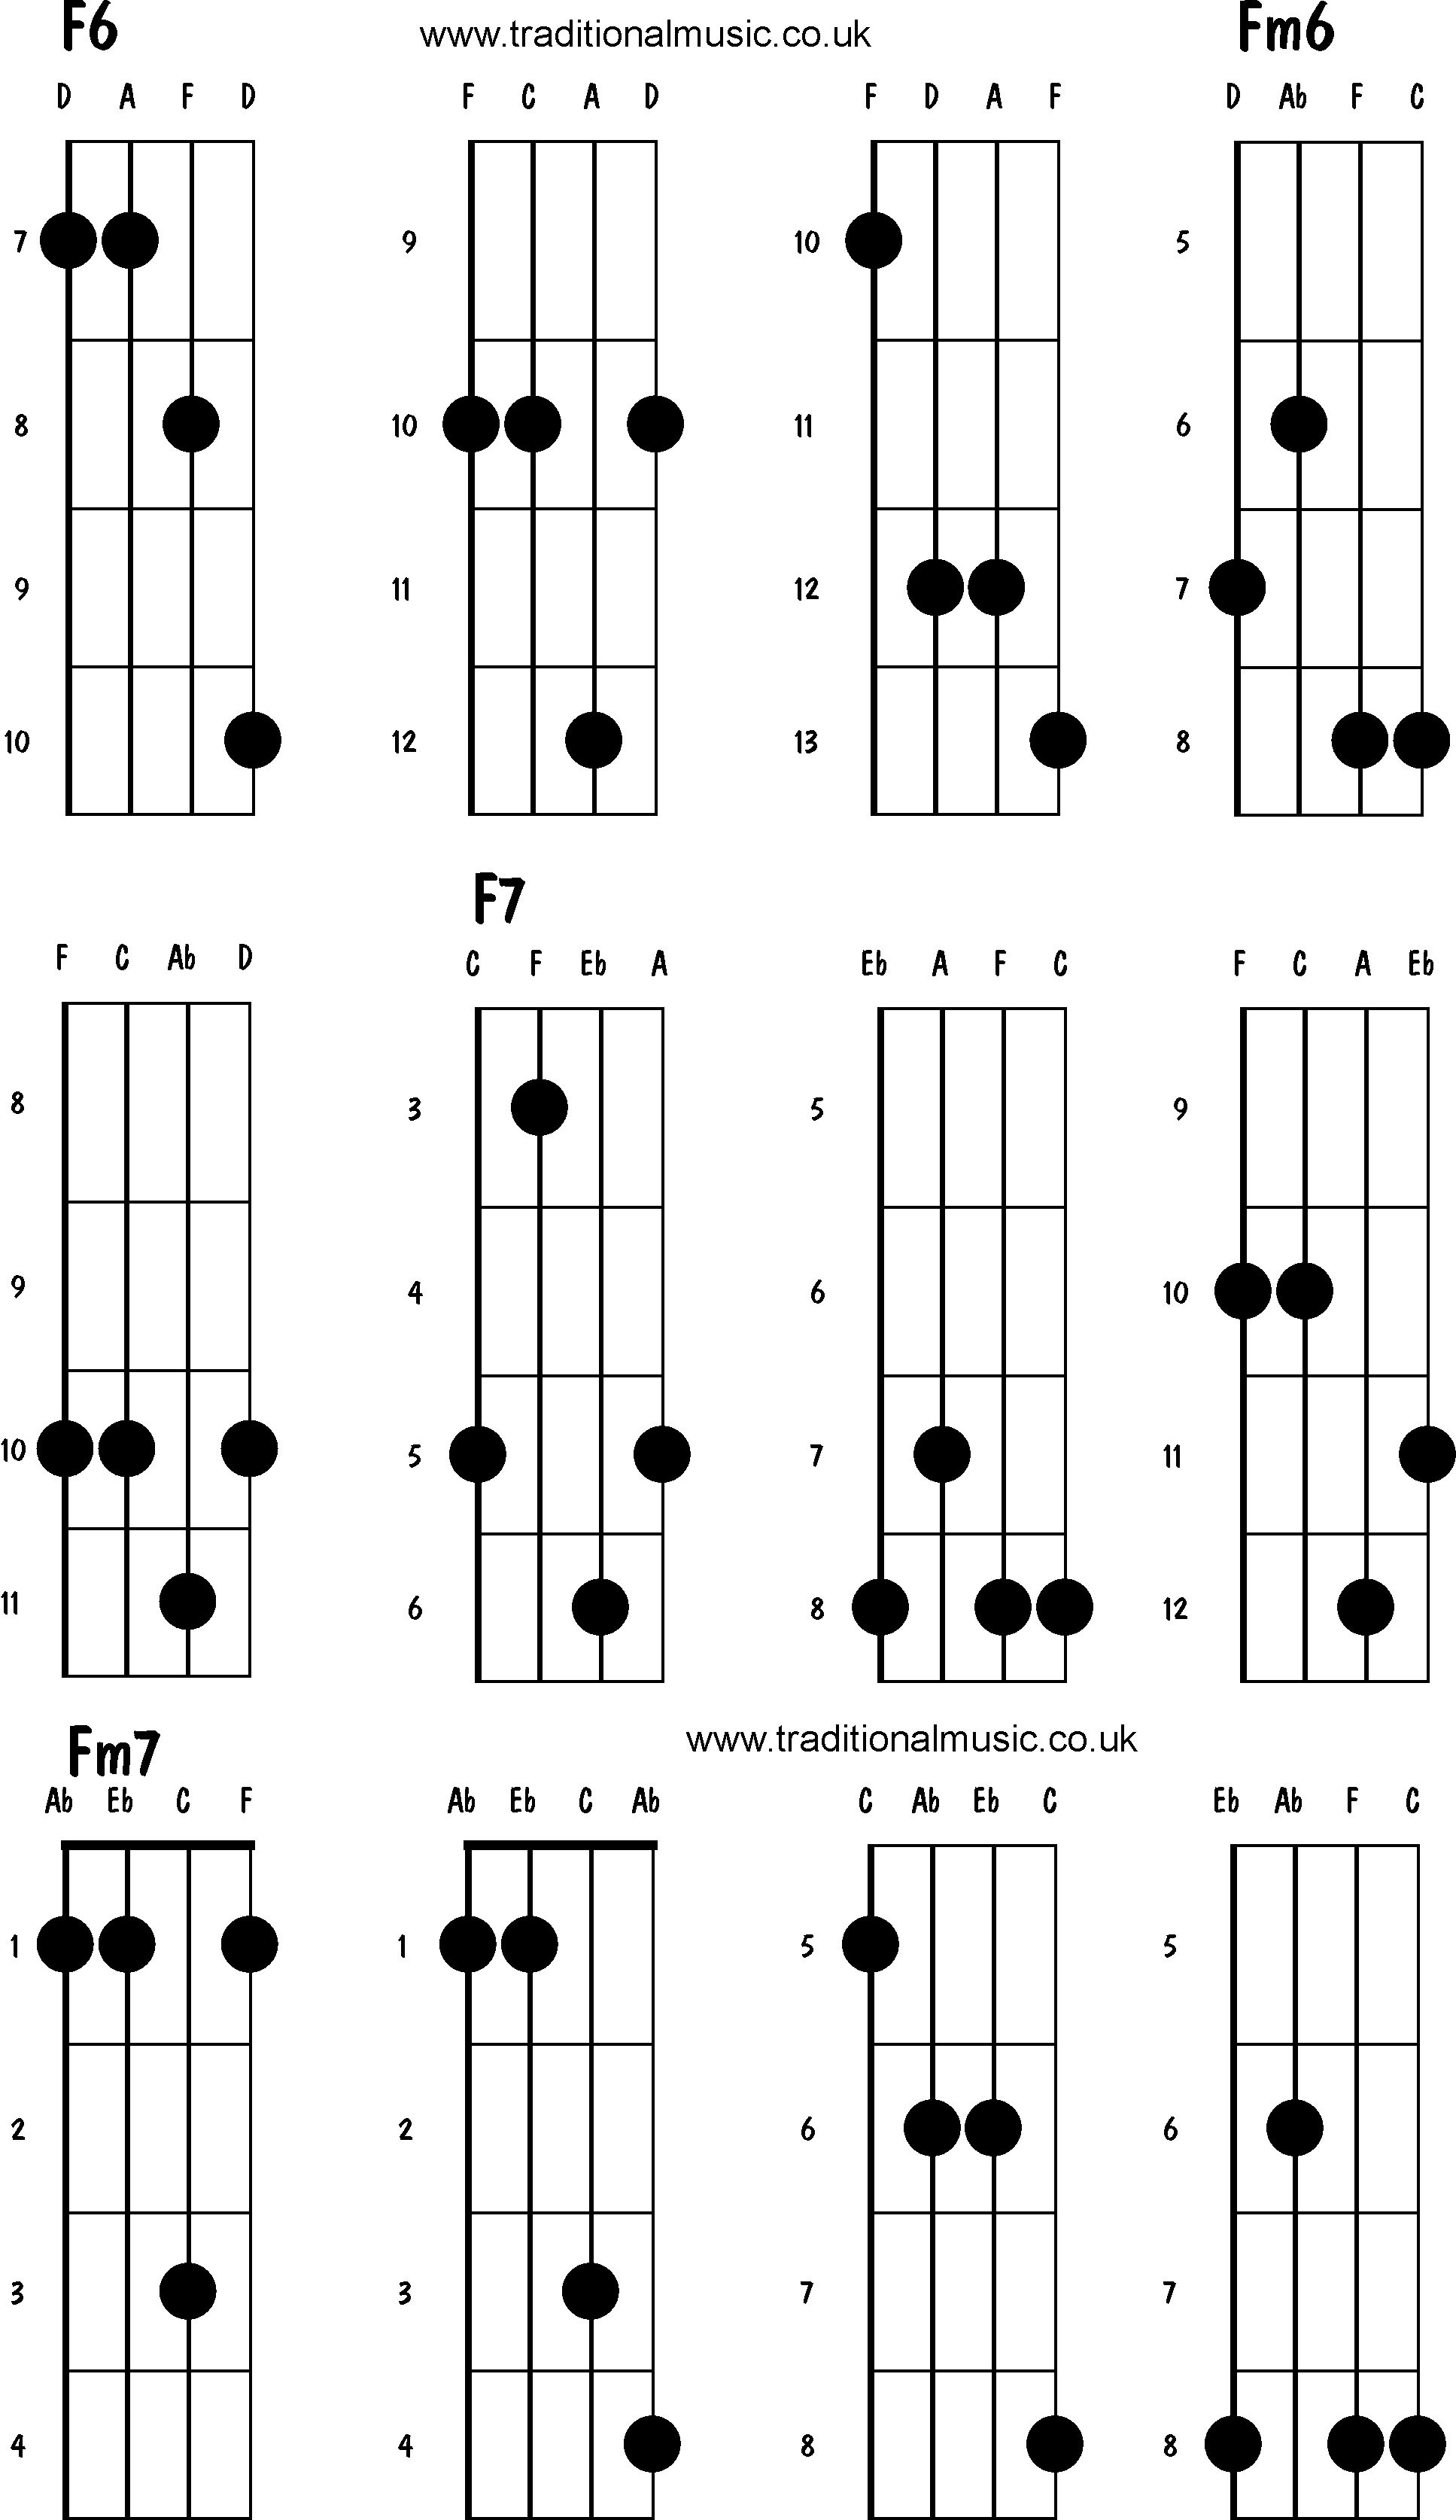 Mandolin Chords Advanced F6 Fm6 F7 Fm7 Music Class